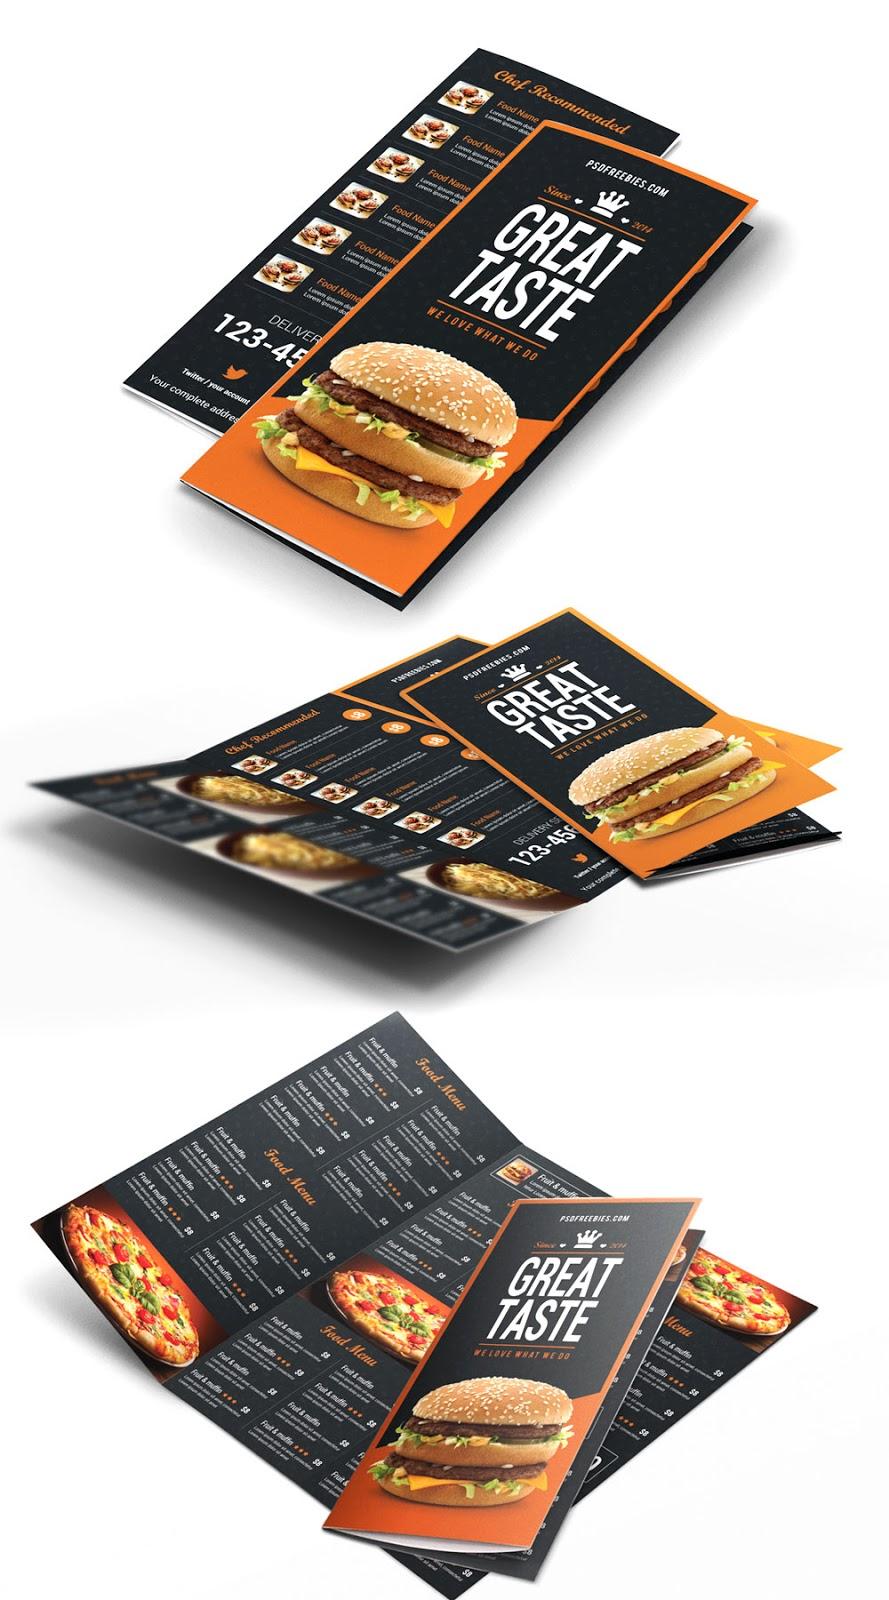 Menú para restaurante, editable en Photoshop | Utilidades Webblog